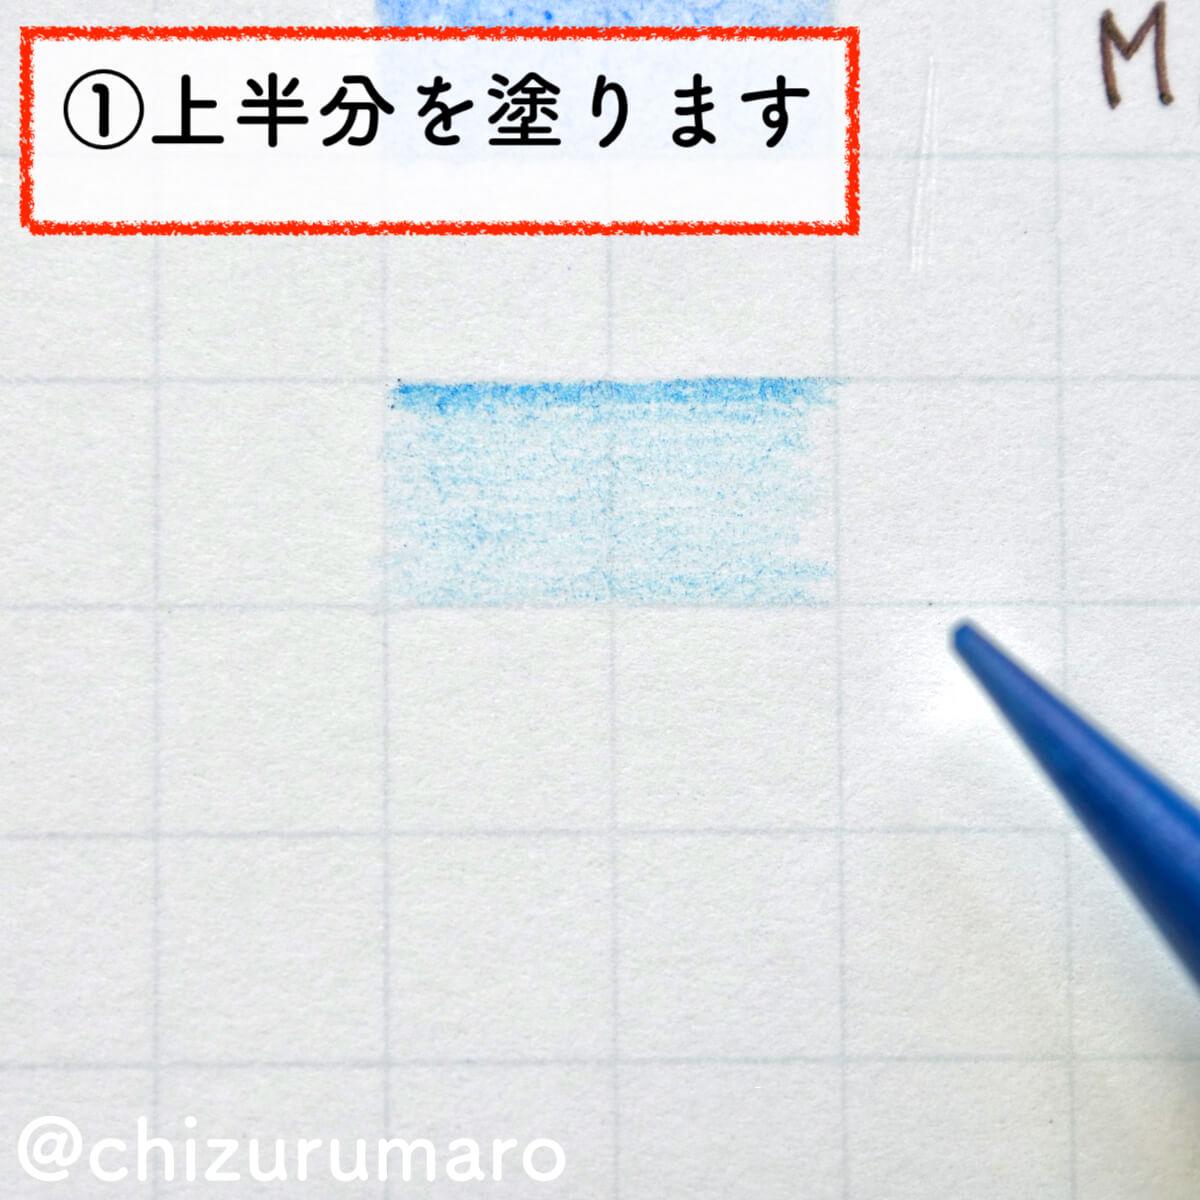 f:id:chizurumaro:20200921215941j:plain